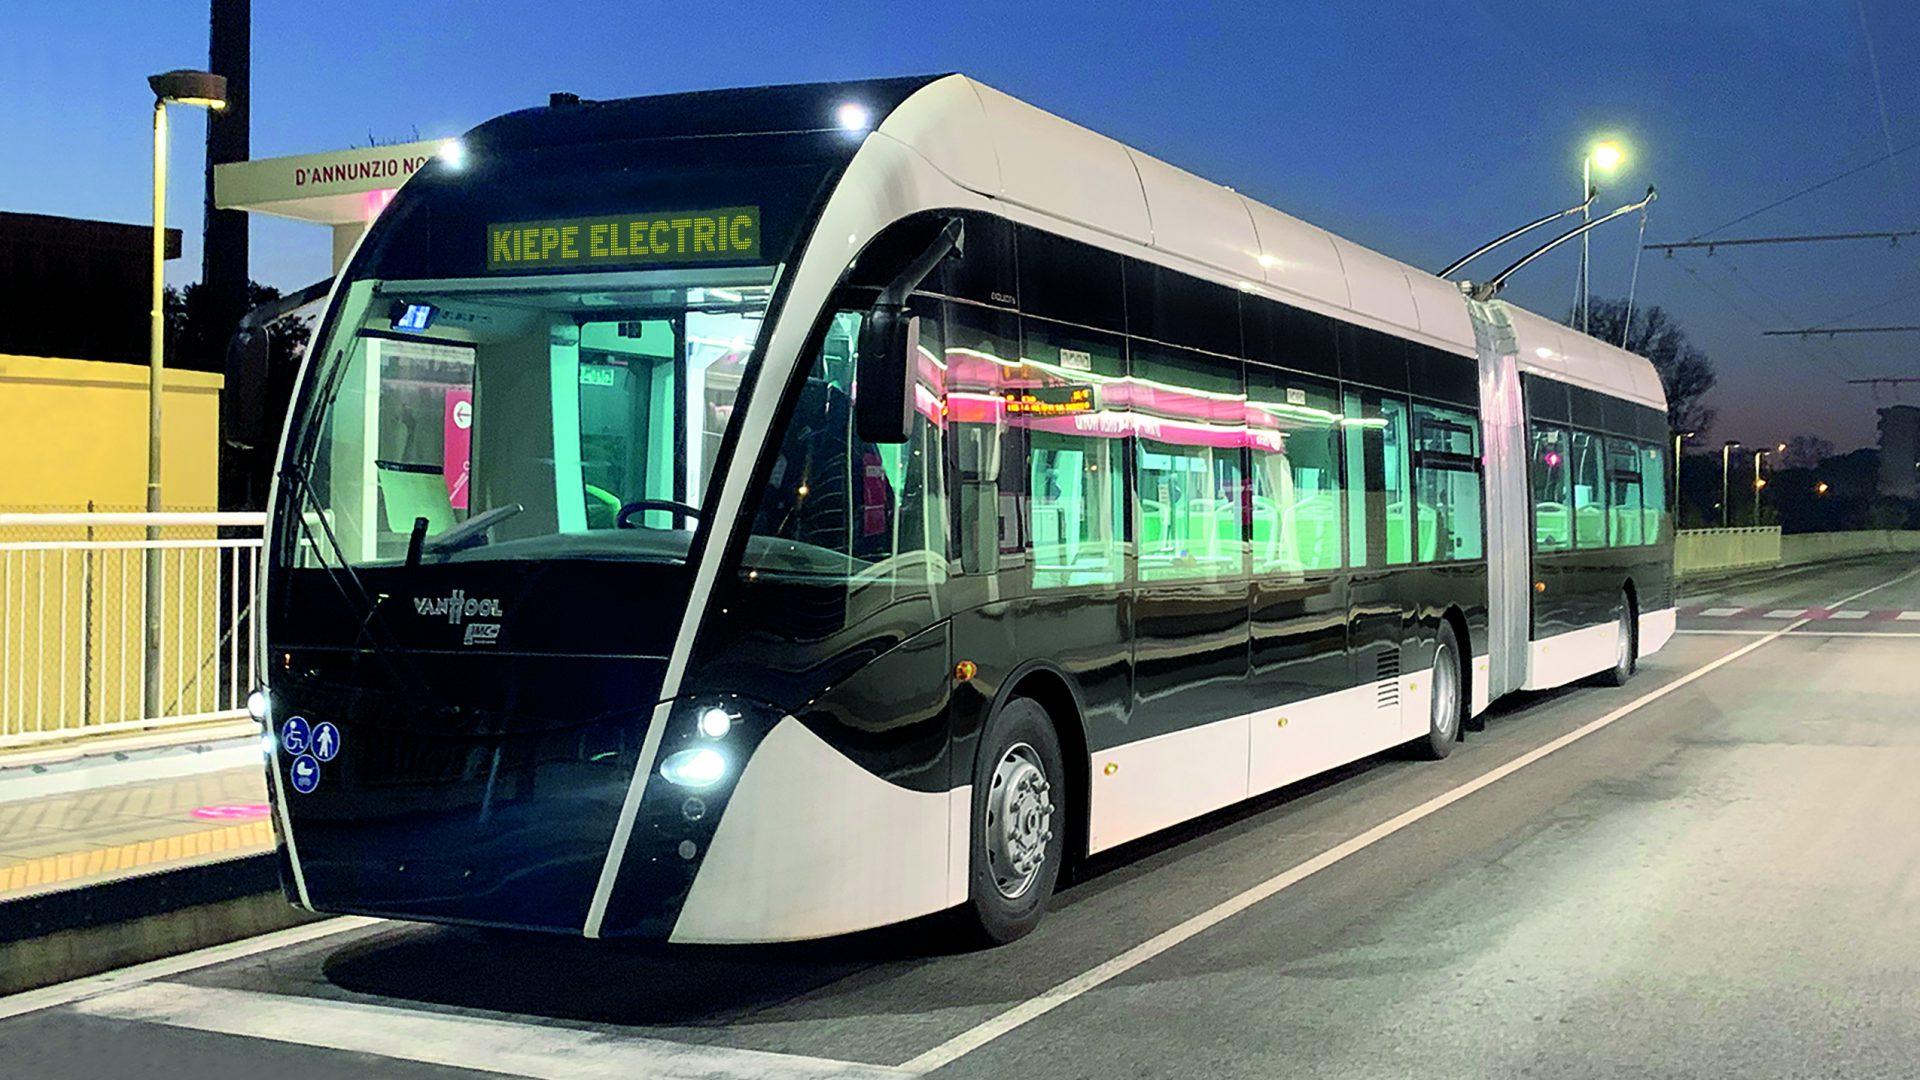 kiepe electric filobus